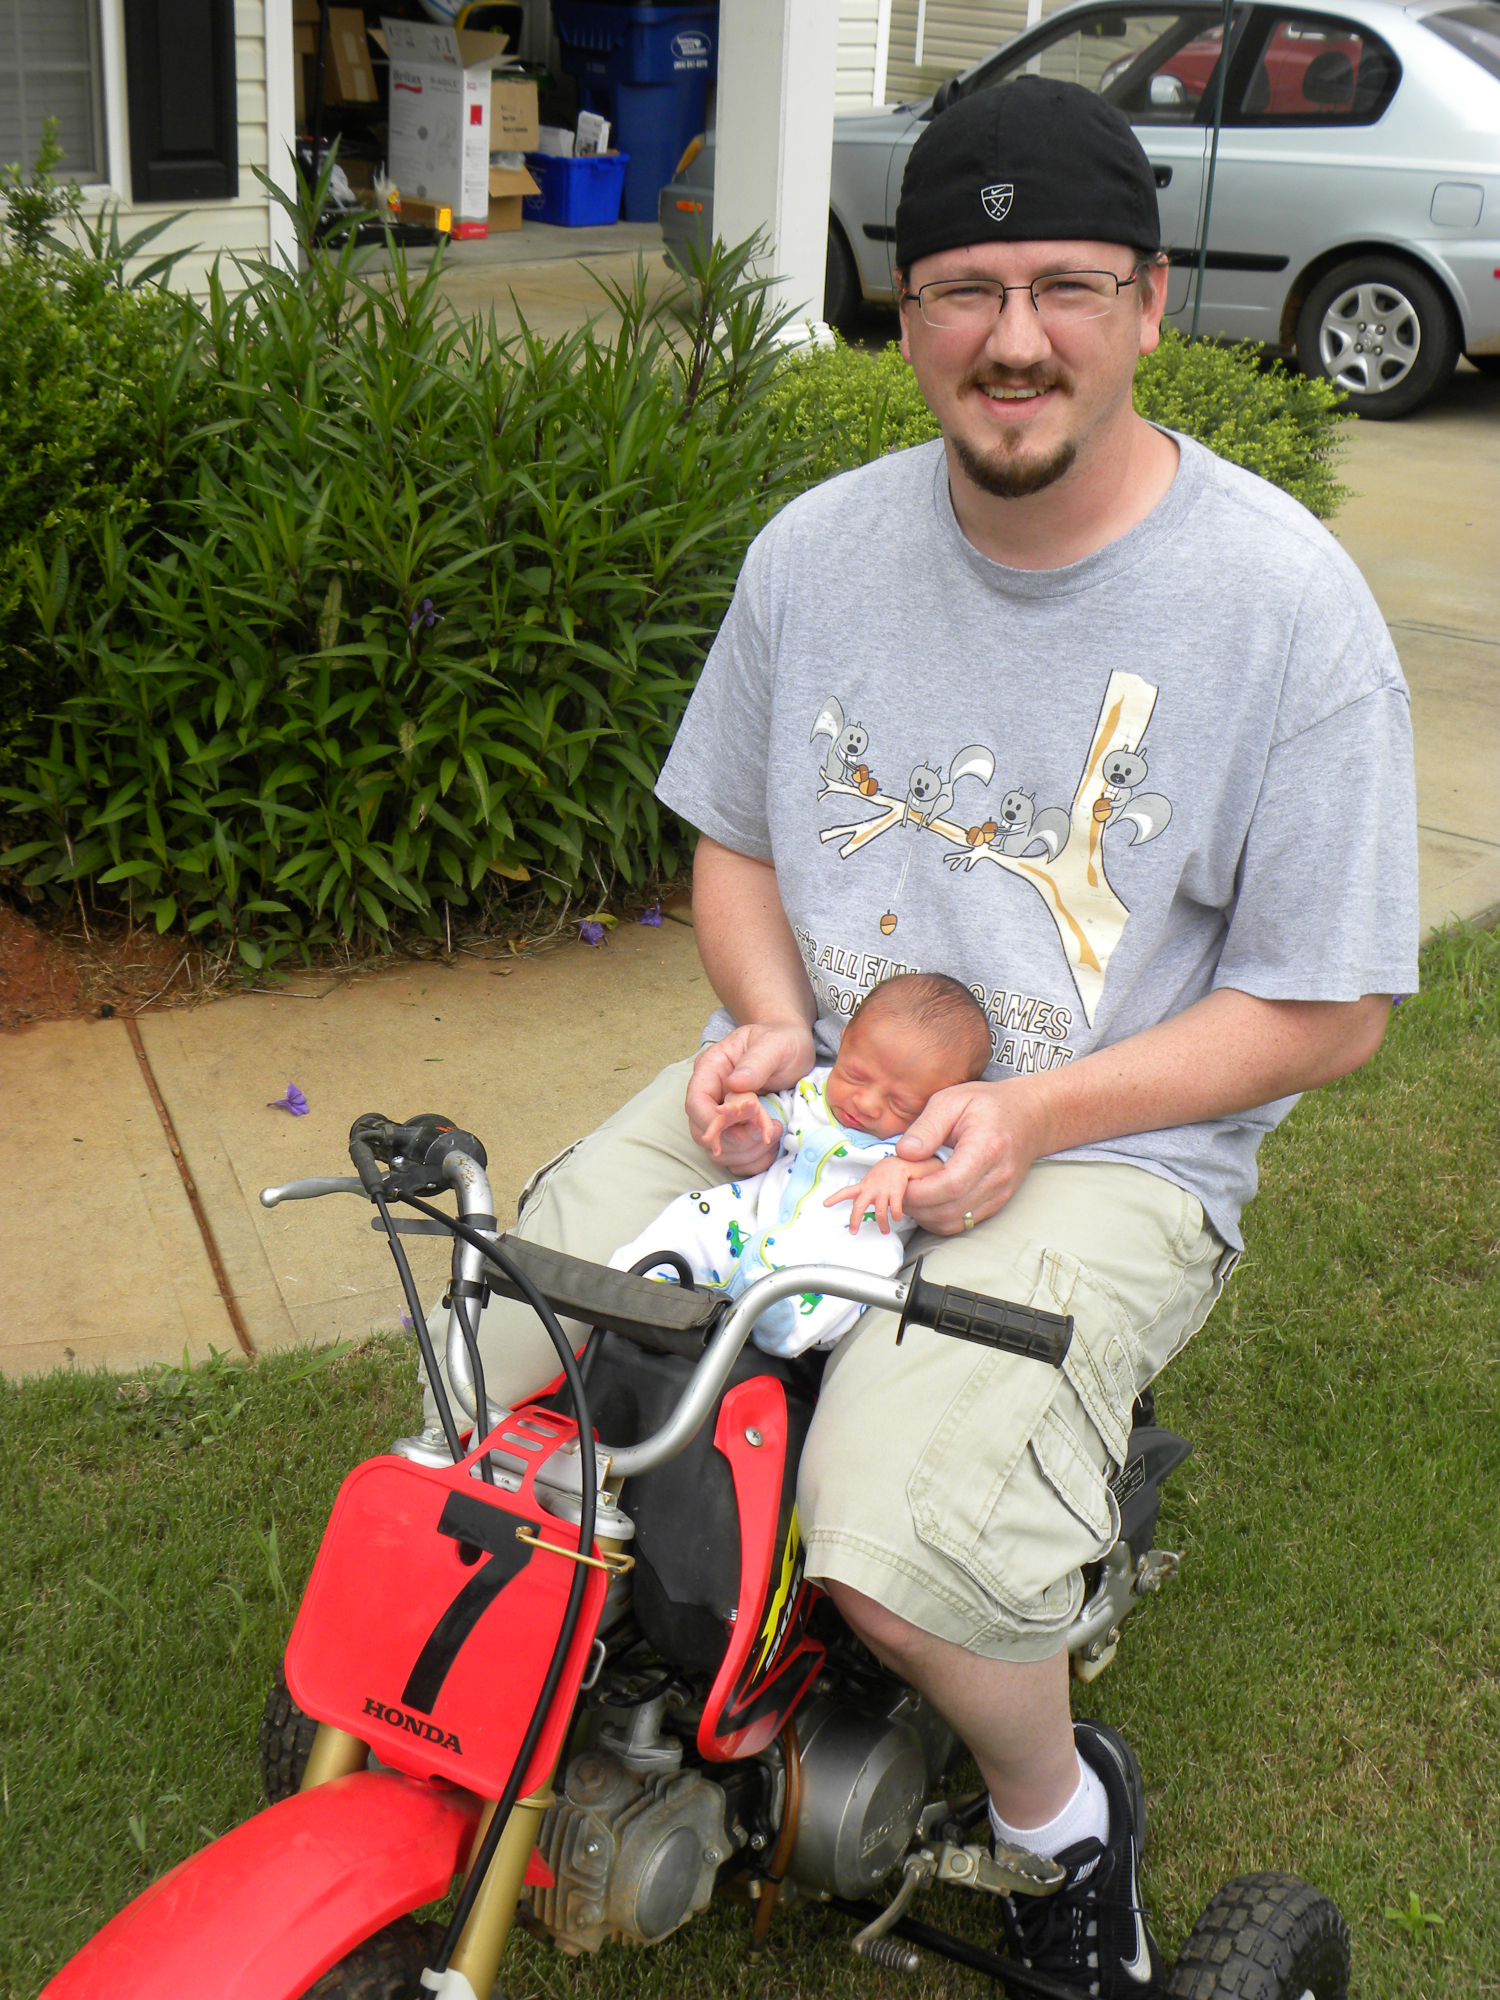 Me and Jaxon on his new dirt bike